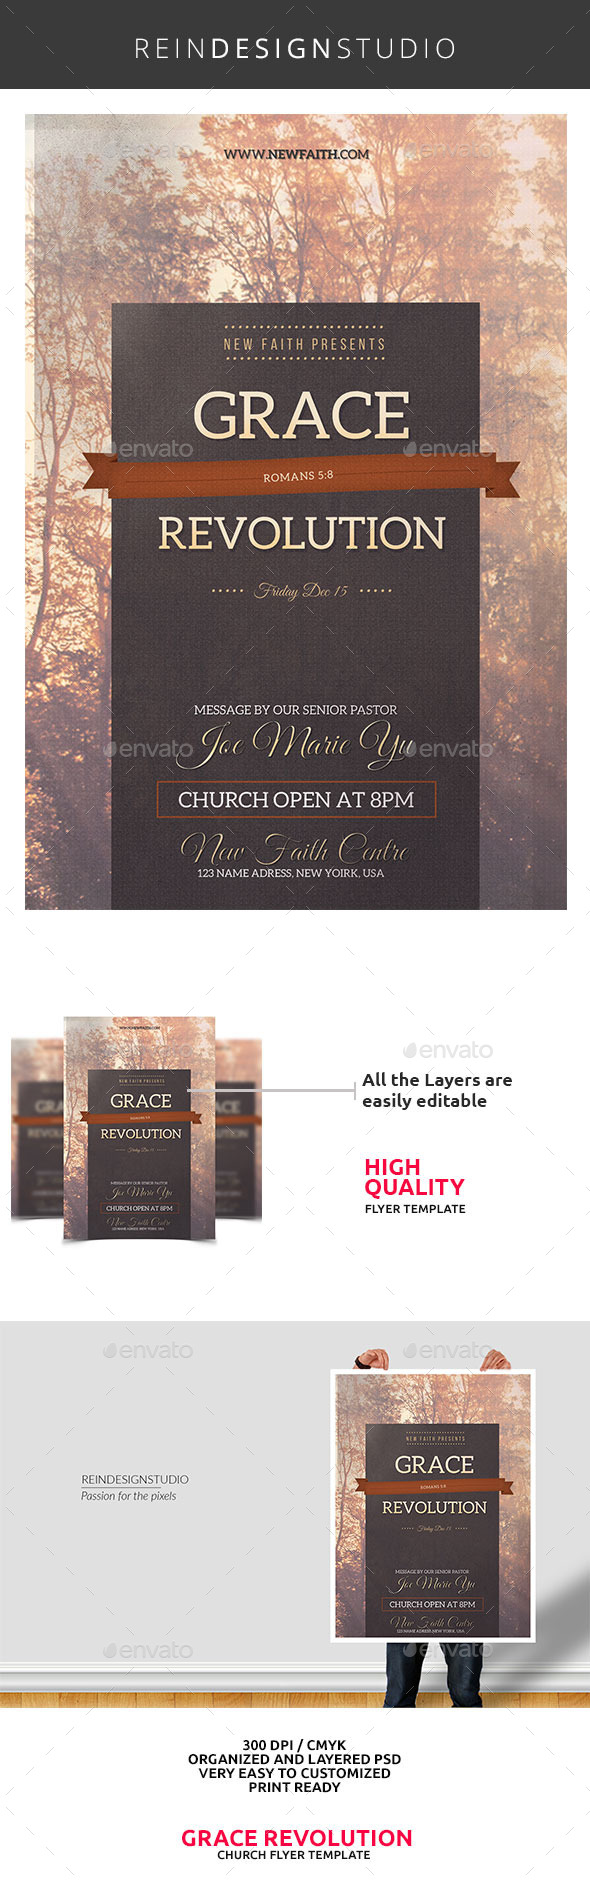 Grace Revolution Church Flyer - Church Flyers